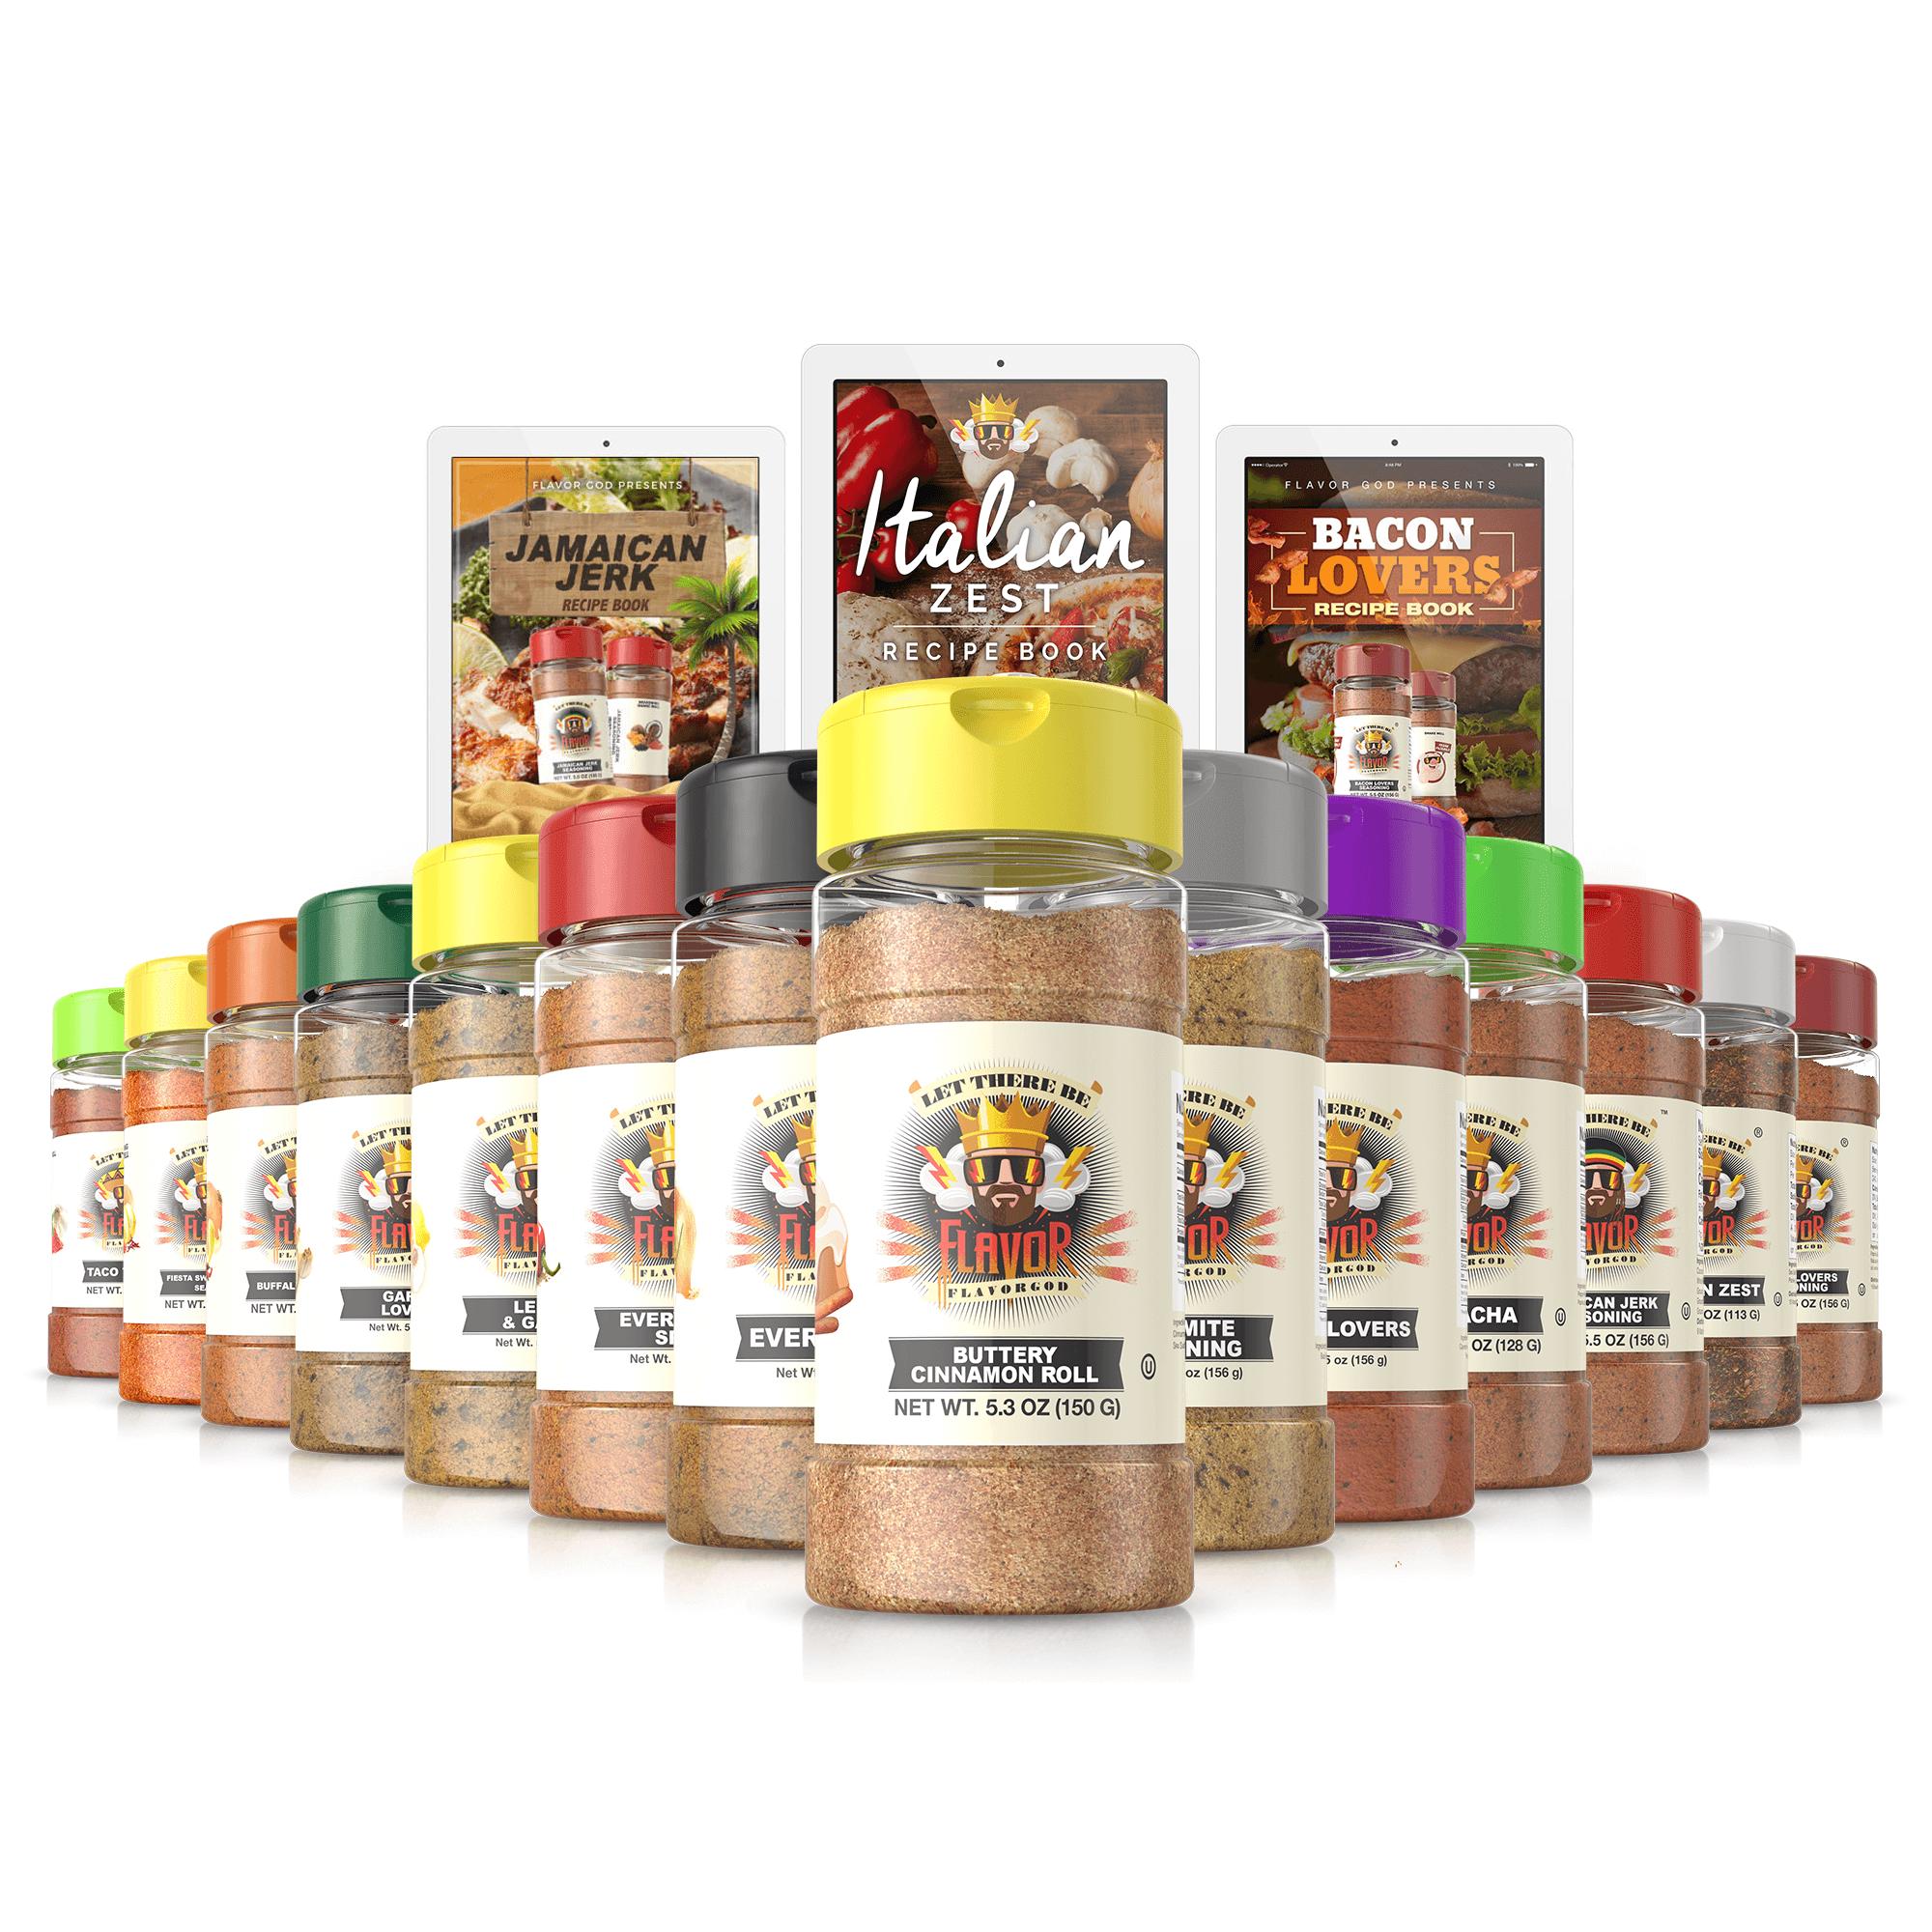 Chef Spice Rack